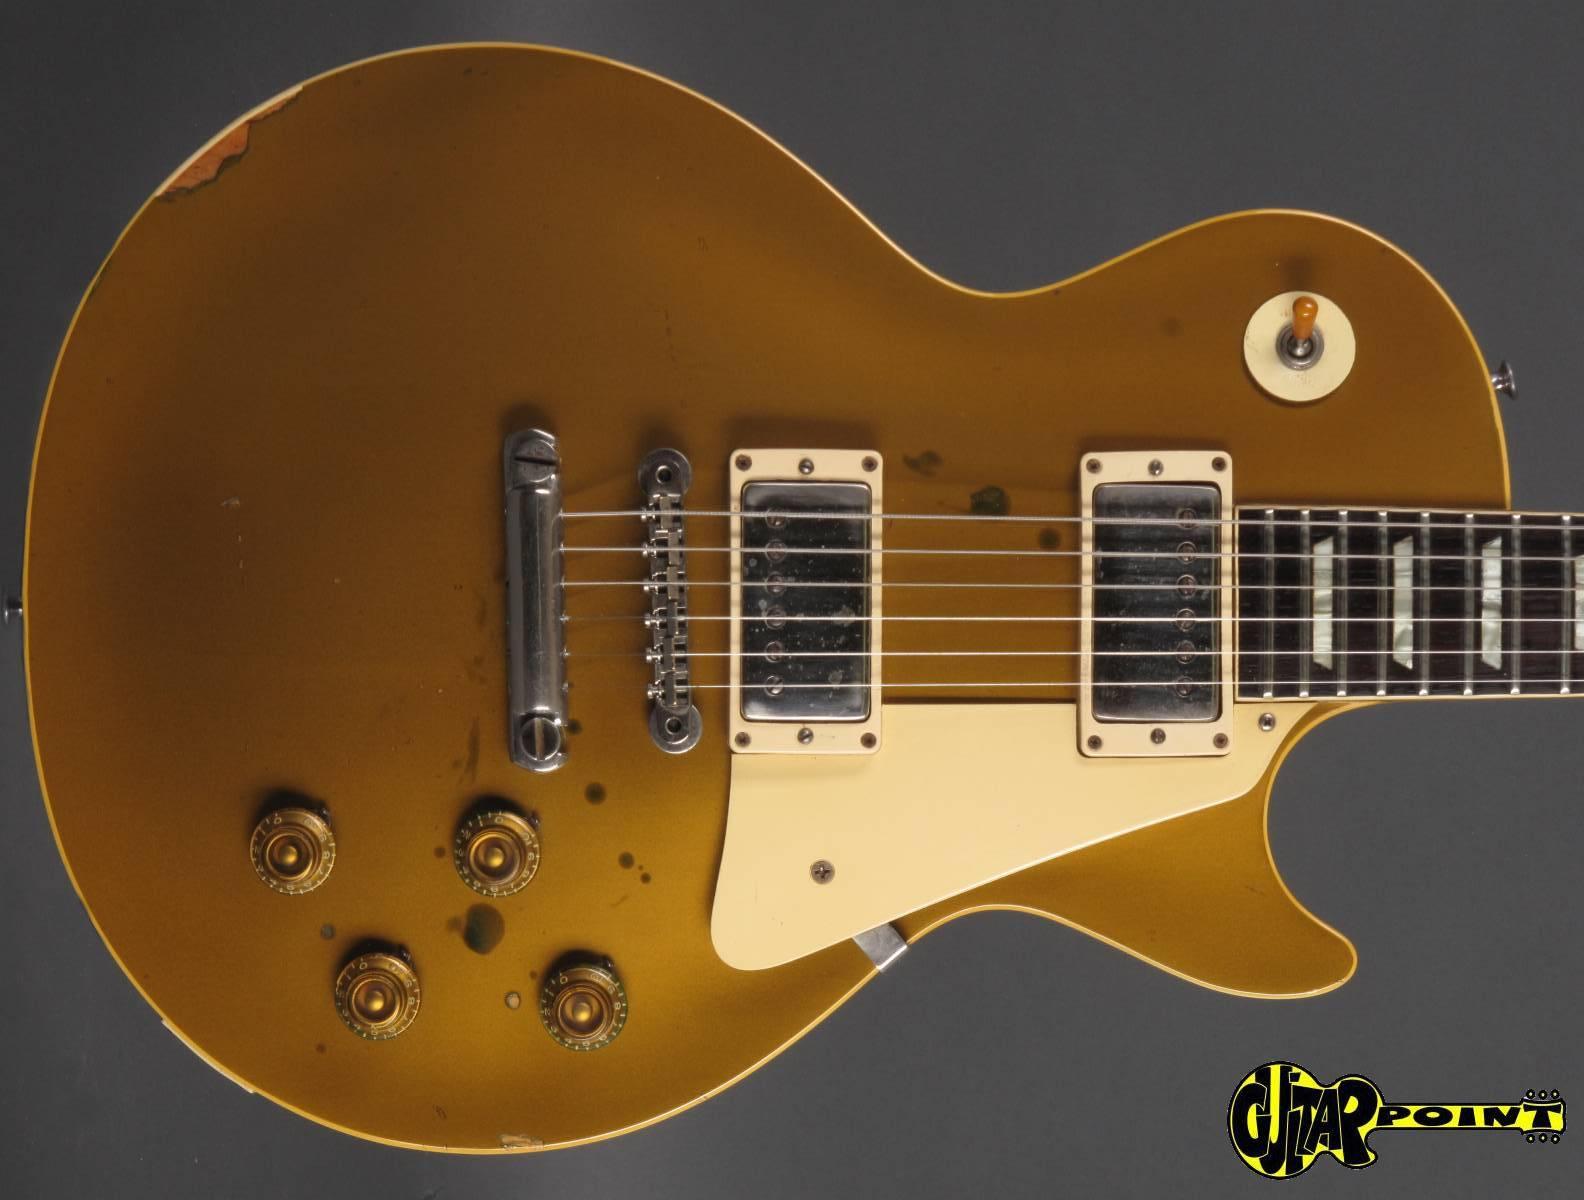 gibson les paul standard goldtop 1957 goltop gold metallic guitar for sale guitarpoint. Black Bedroom Furniture Sets. Home Design Ideas